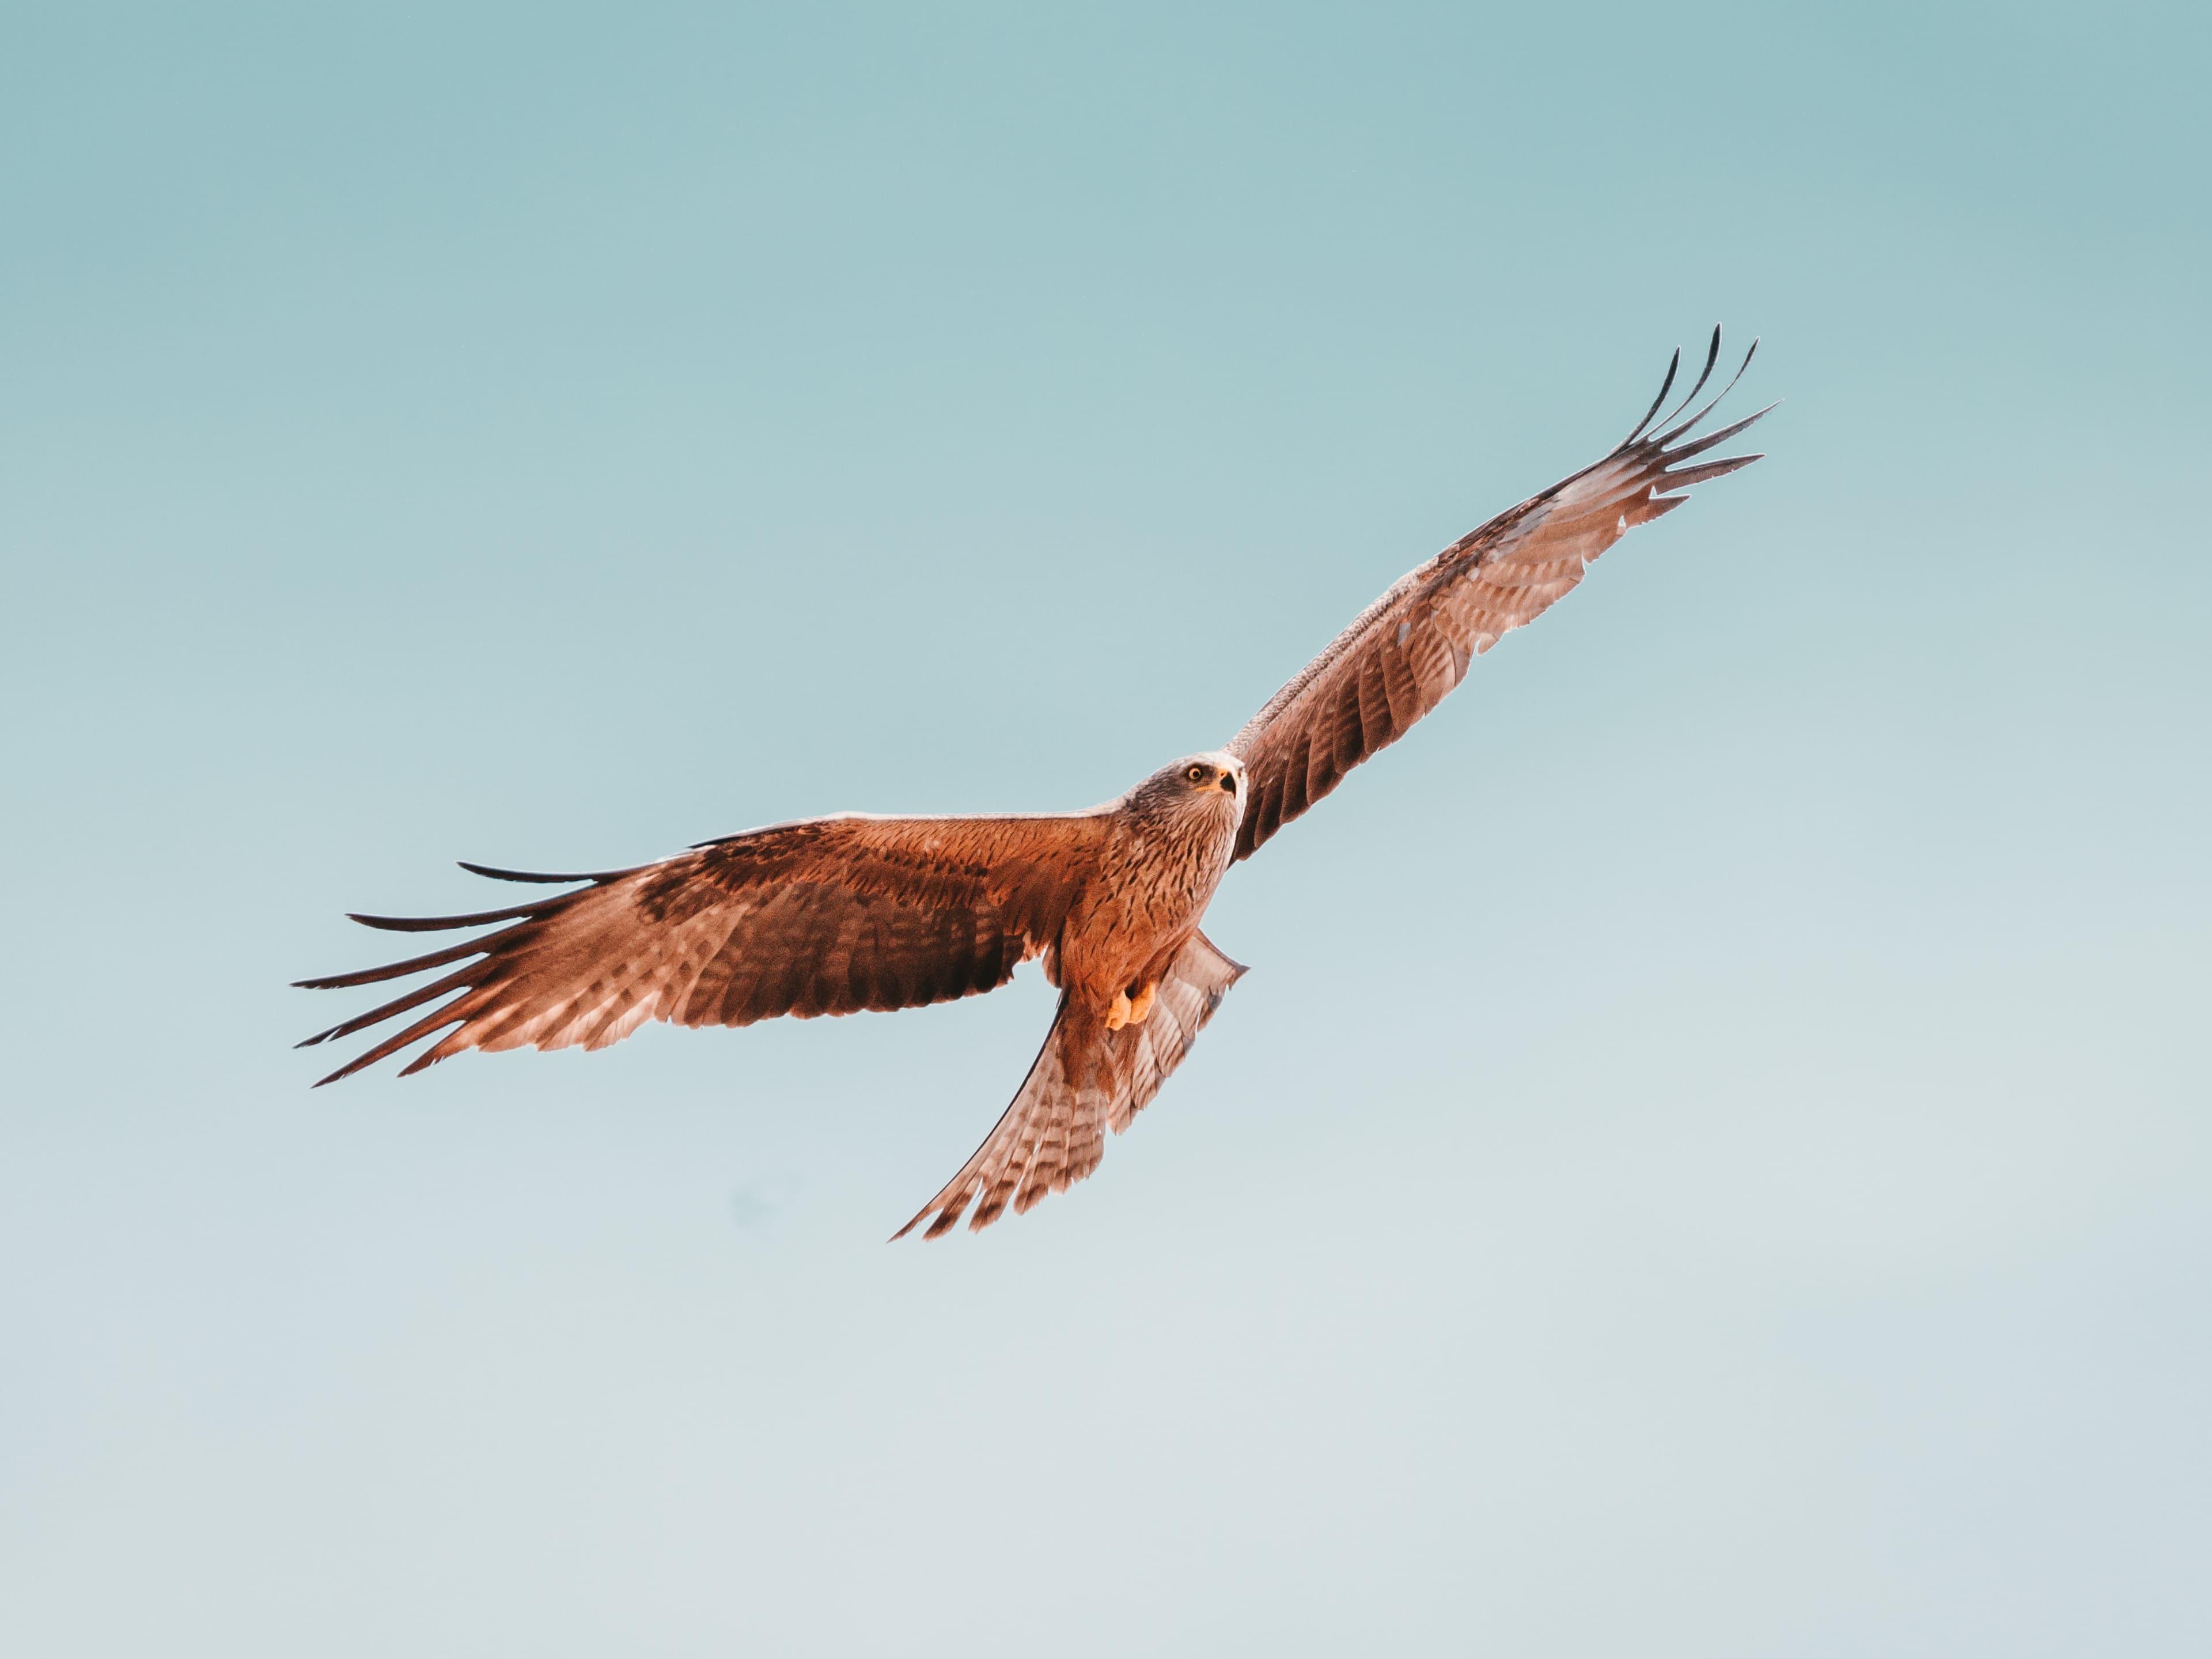 Ein Greifvogel (Rotmilan) fliegt am Himmel.